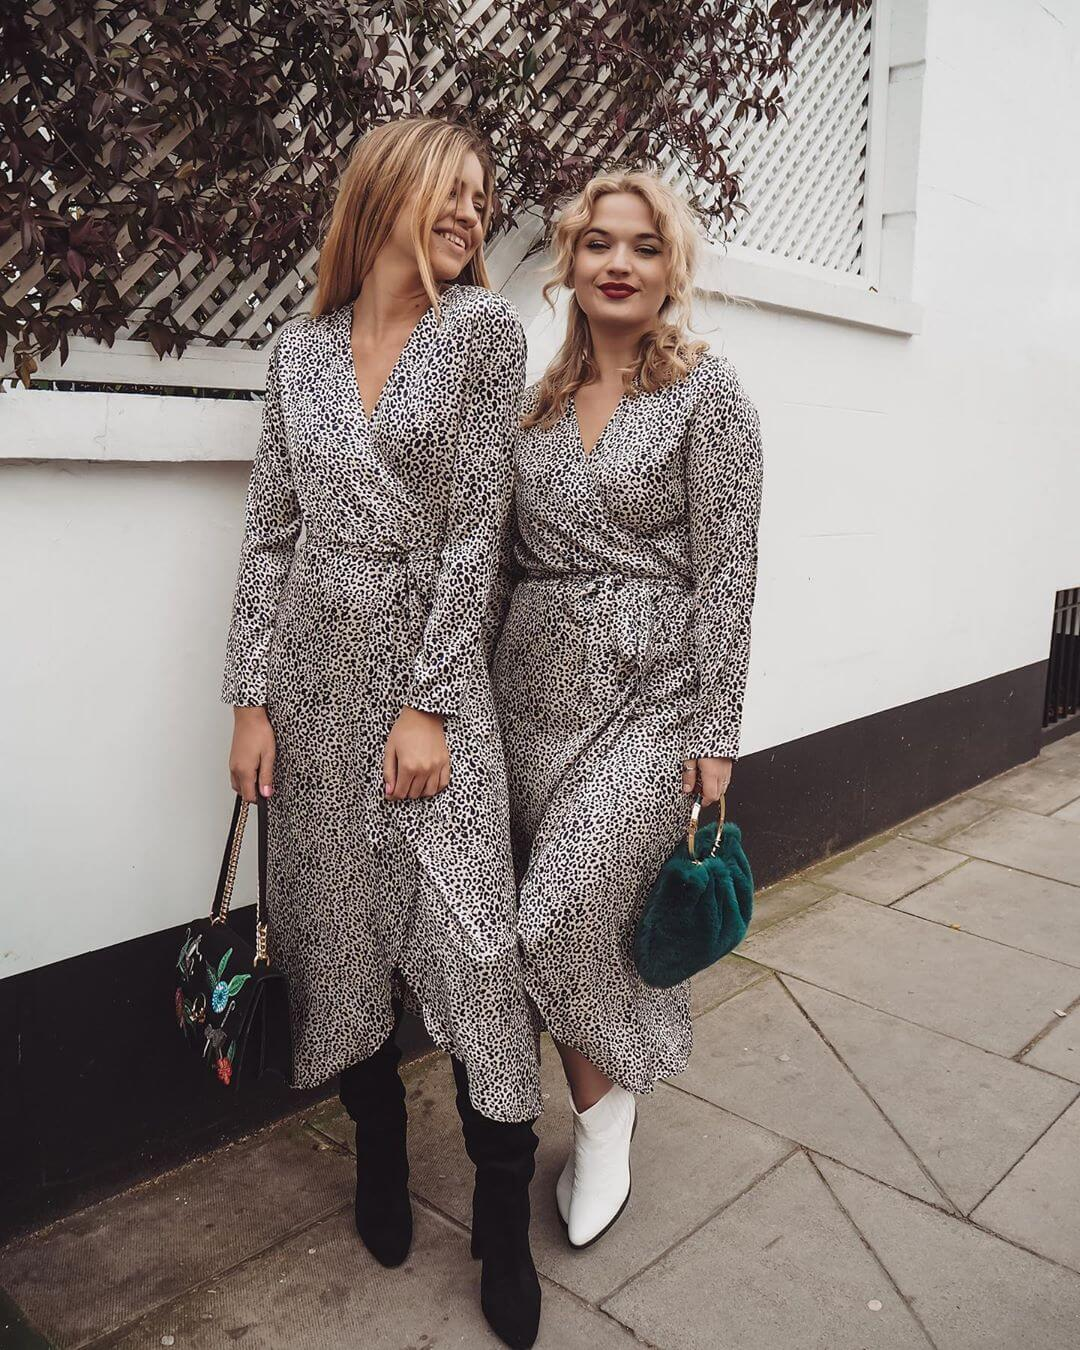 Two models wear the yondal leopard print dress on a london street